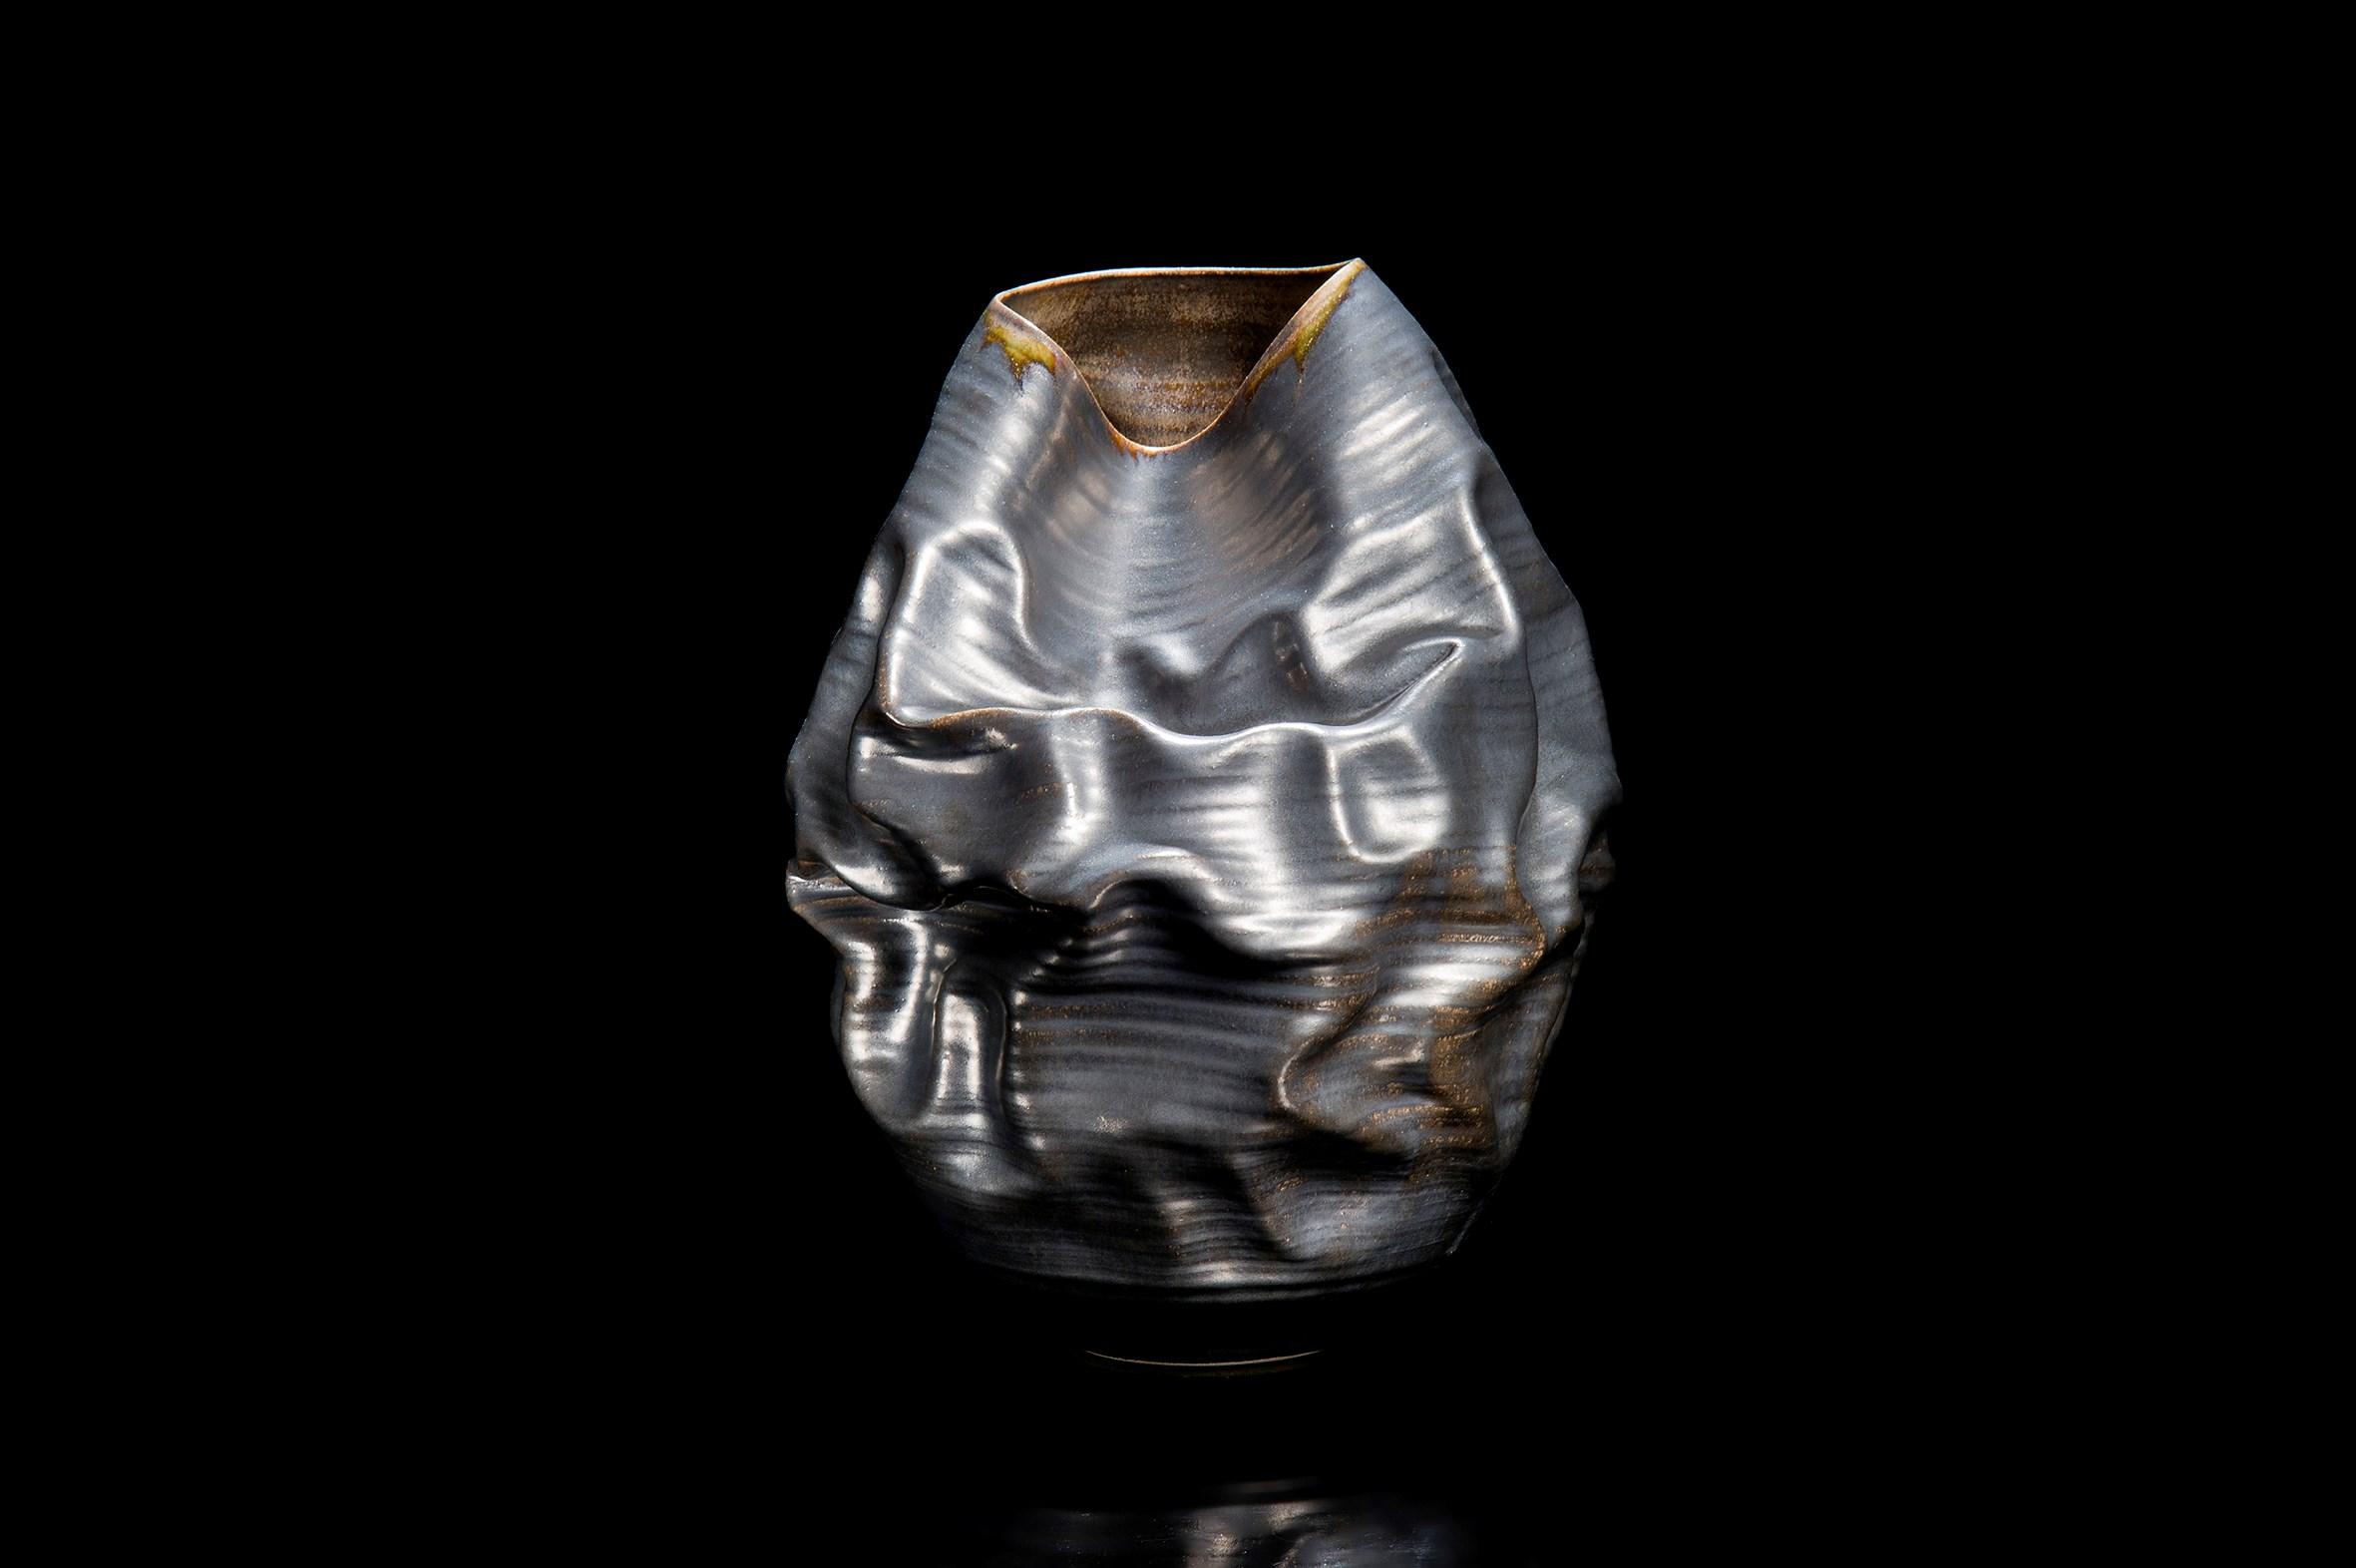 crumpled black art ceramic vase art sculpture Nicholas Arroyave-Portela